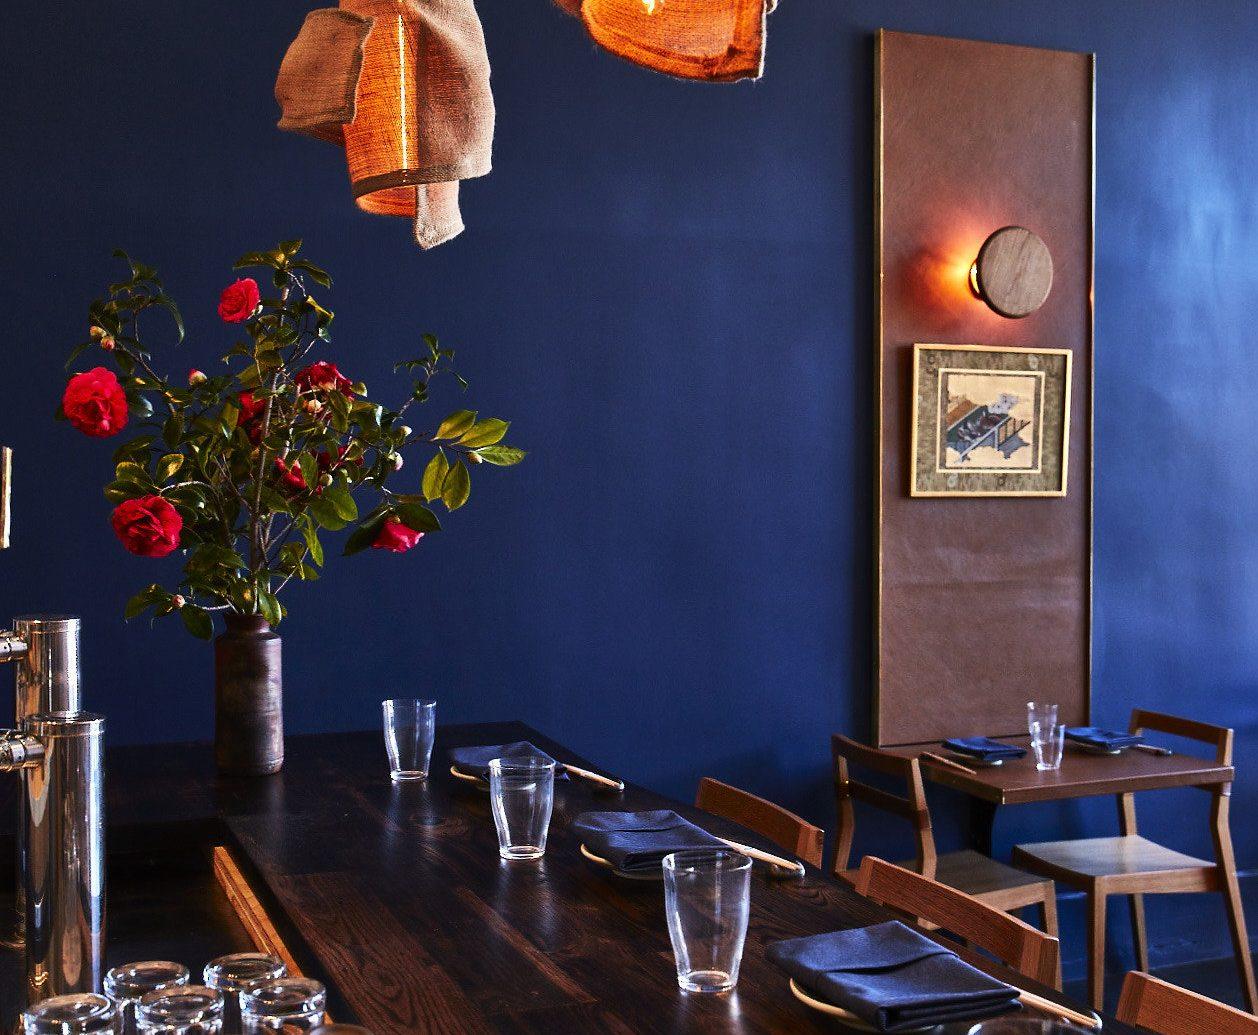 table indoor man made object room restaurant Bar lighting dining room interior design furniture several